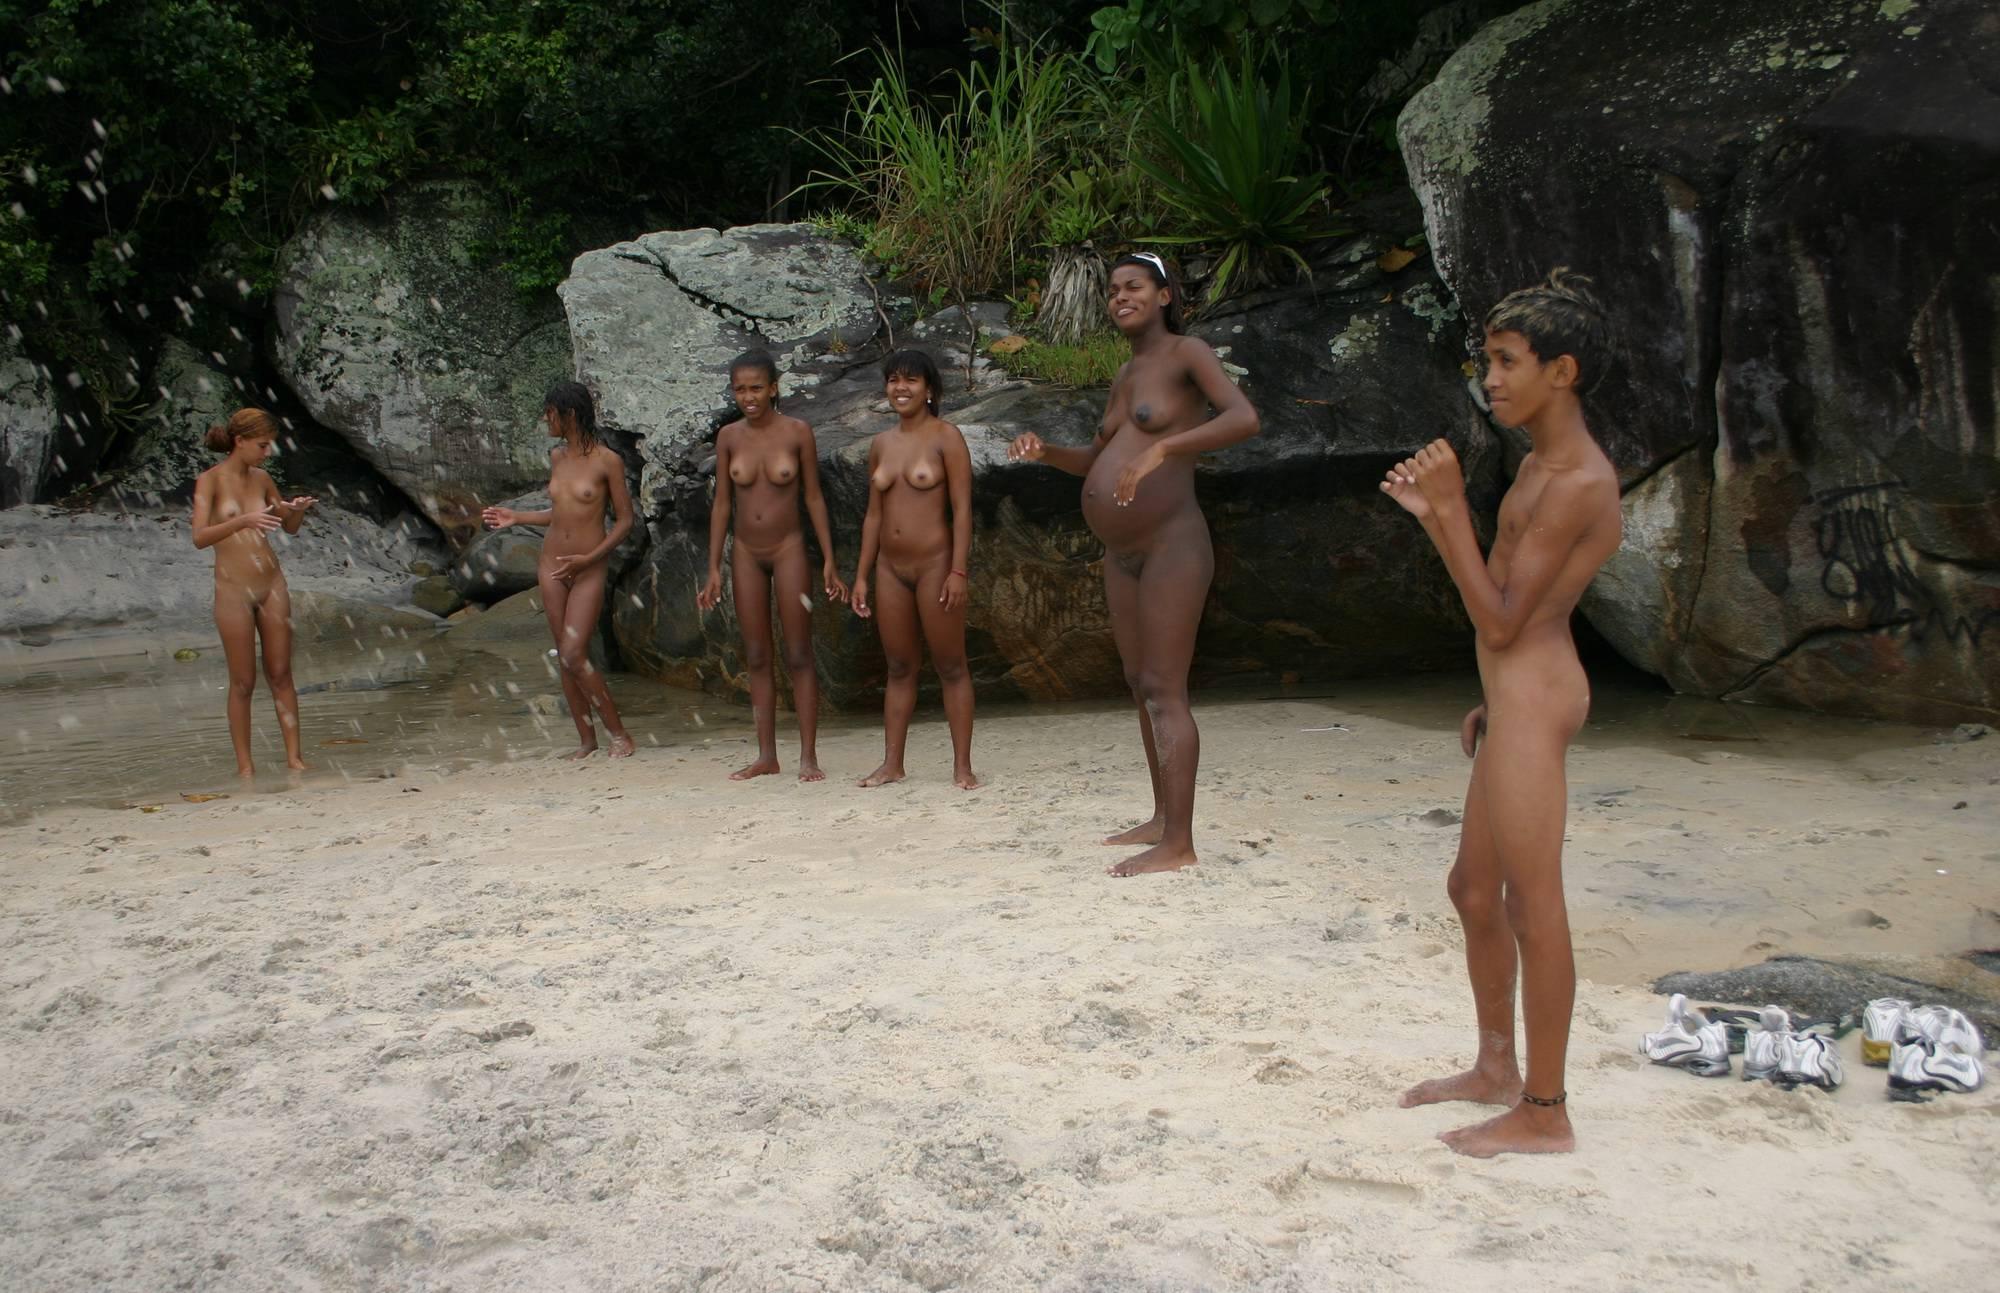 Purenudism Pics-Brazilian Game Gathering - 3